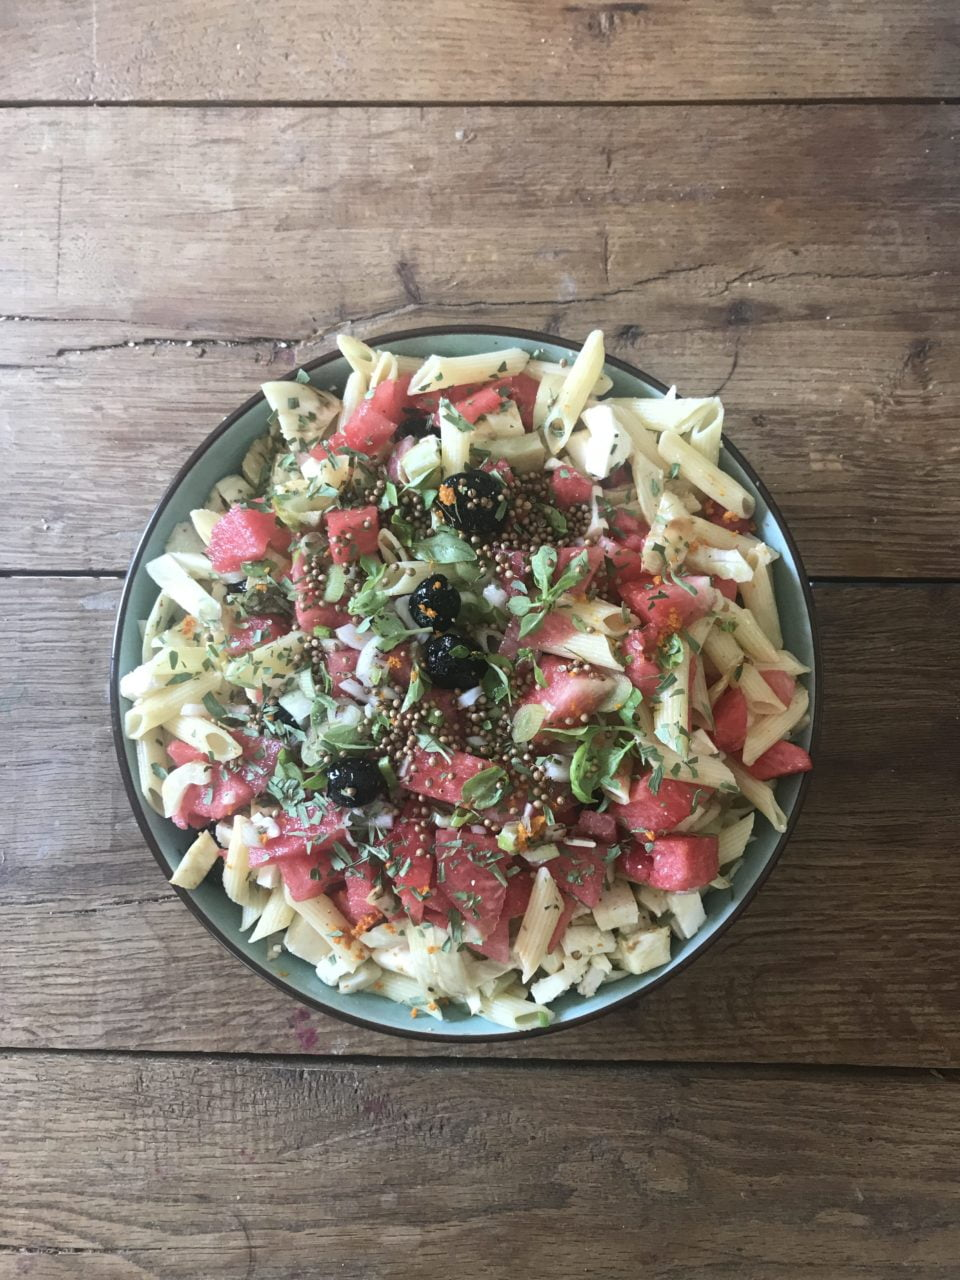 pastasalade-met-watermeloen-feta-en-venkel